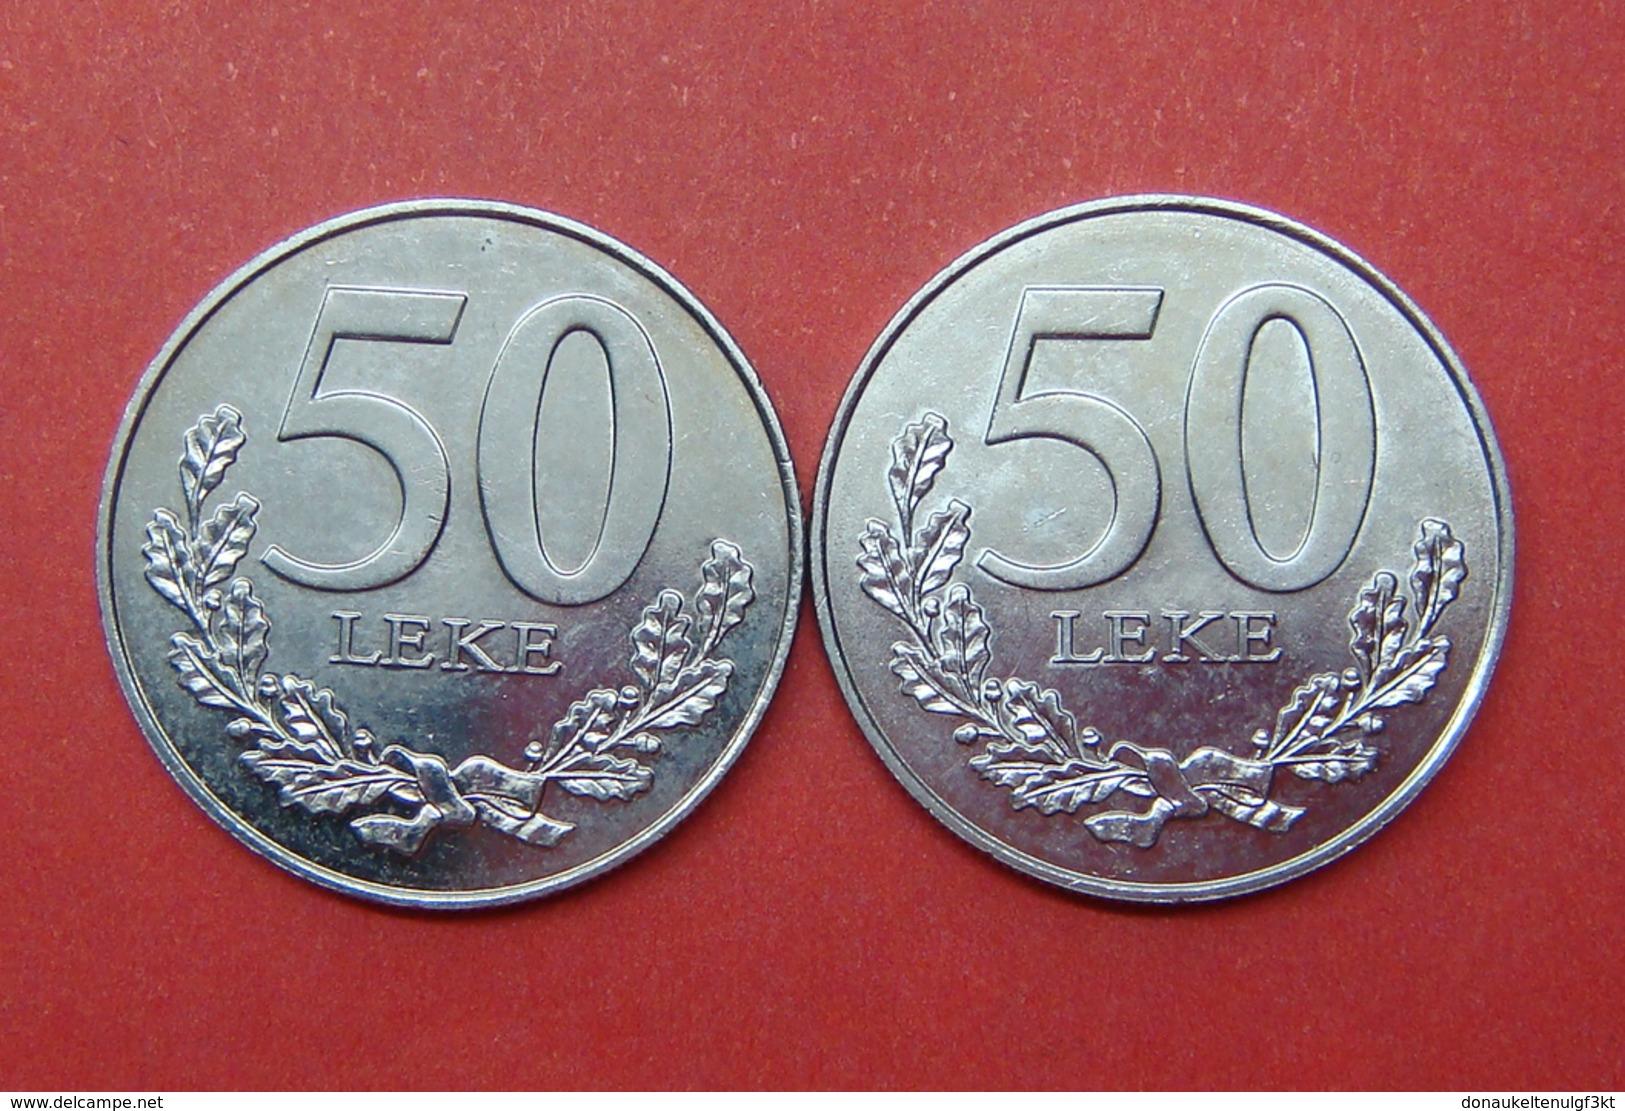 ALBANIA 2 X 50 LEKE 2000, UNC - Albania